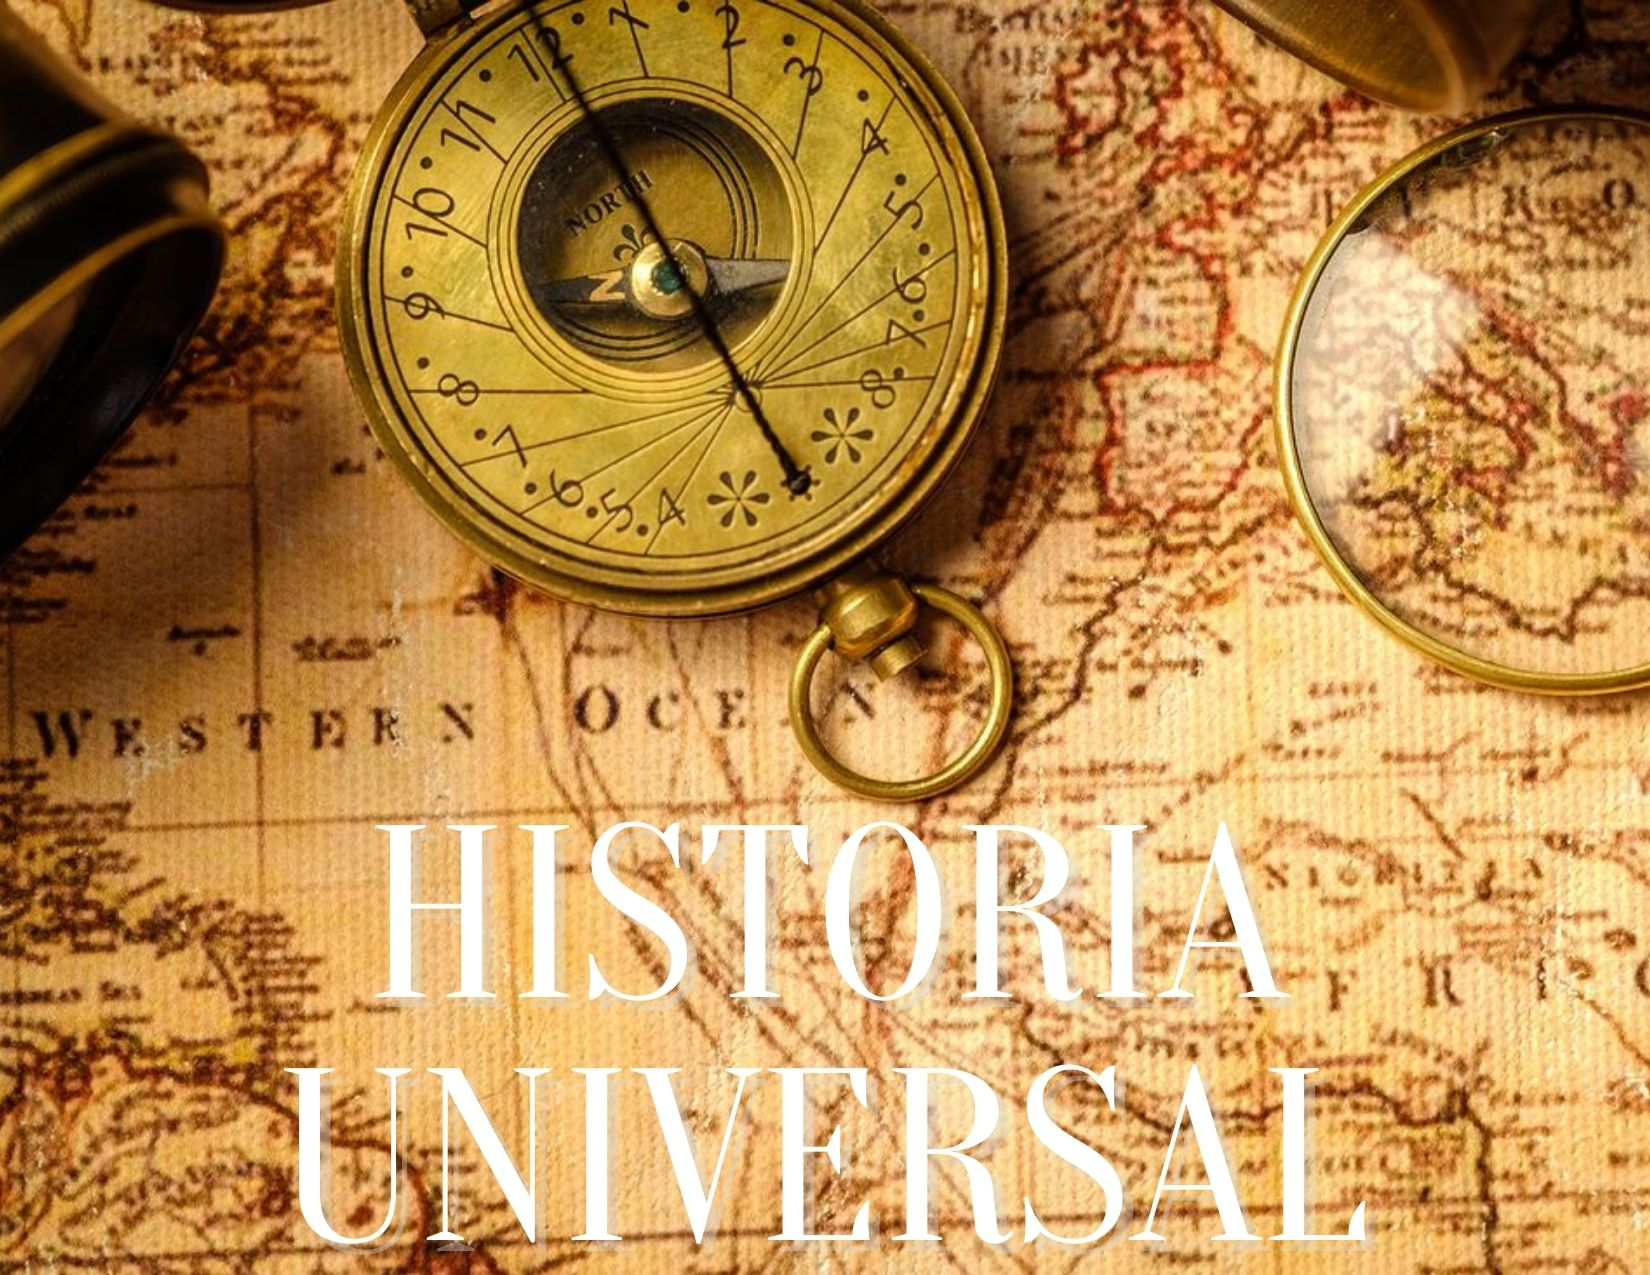 curso de historia universal